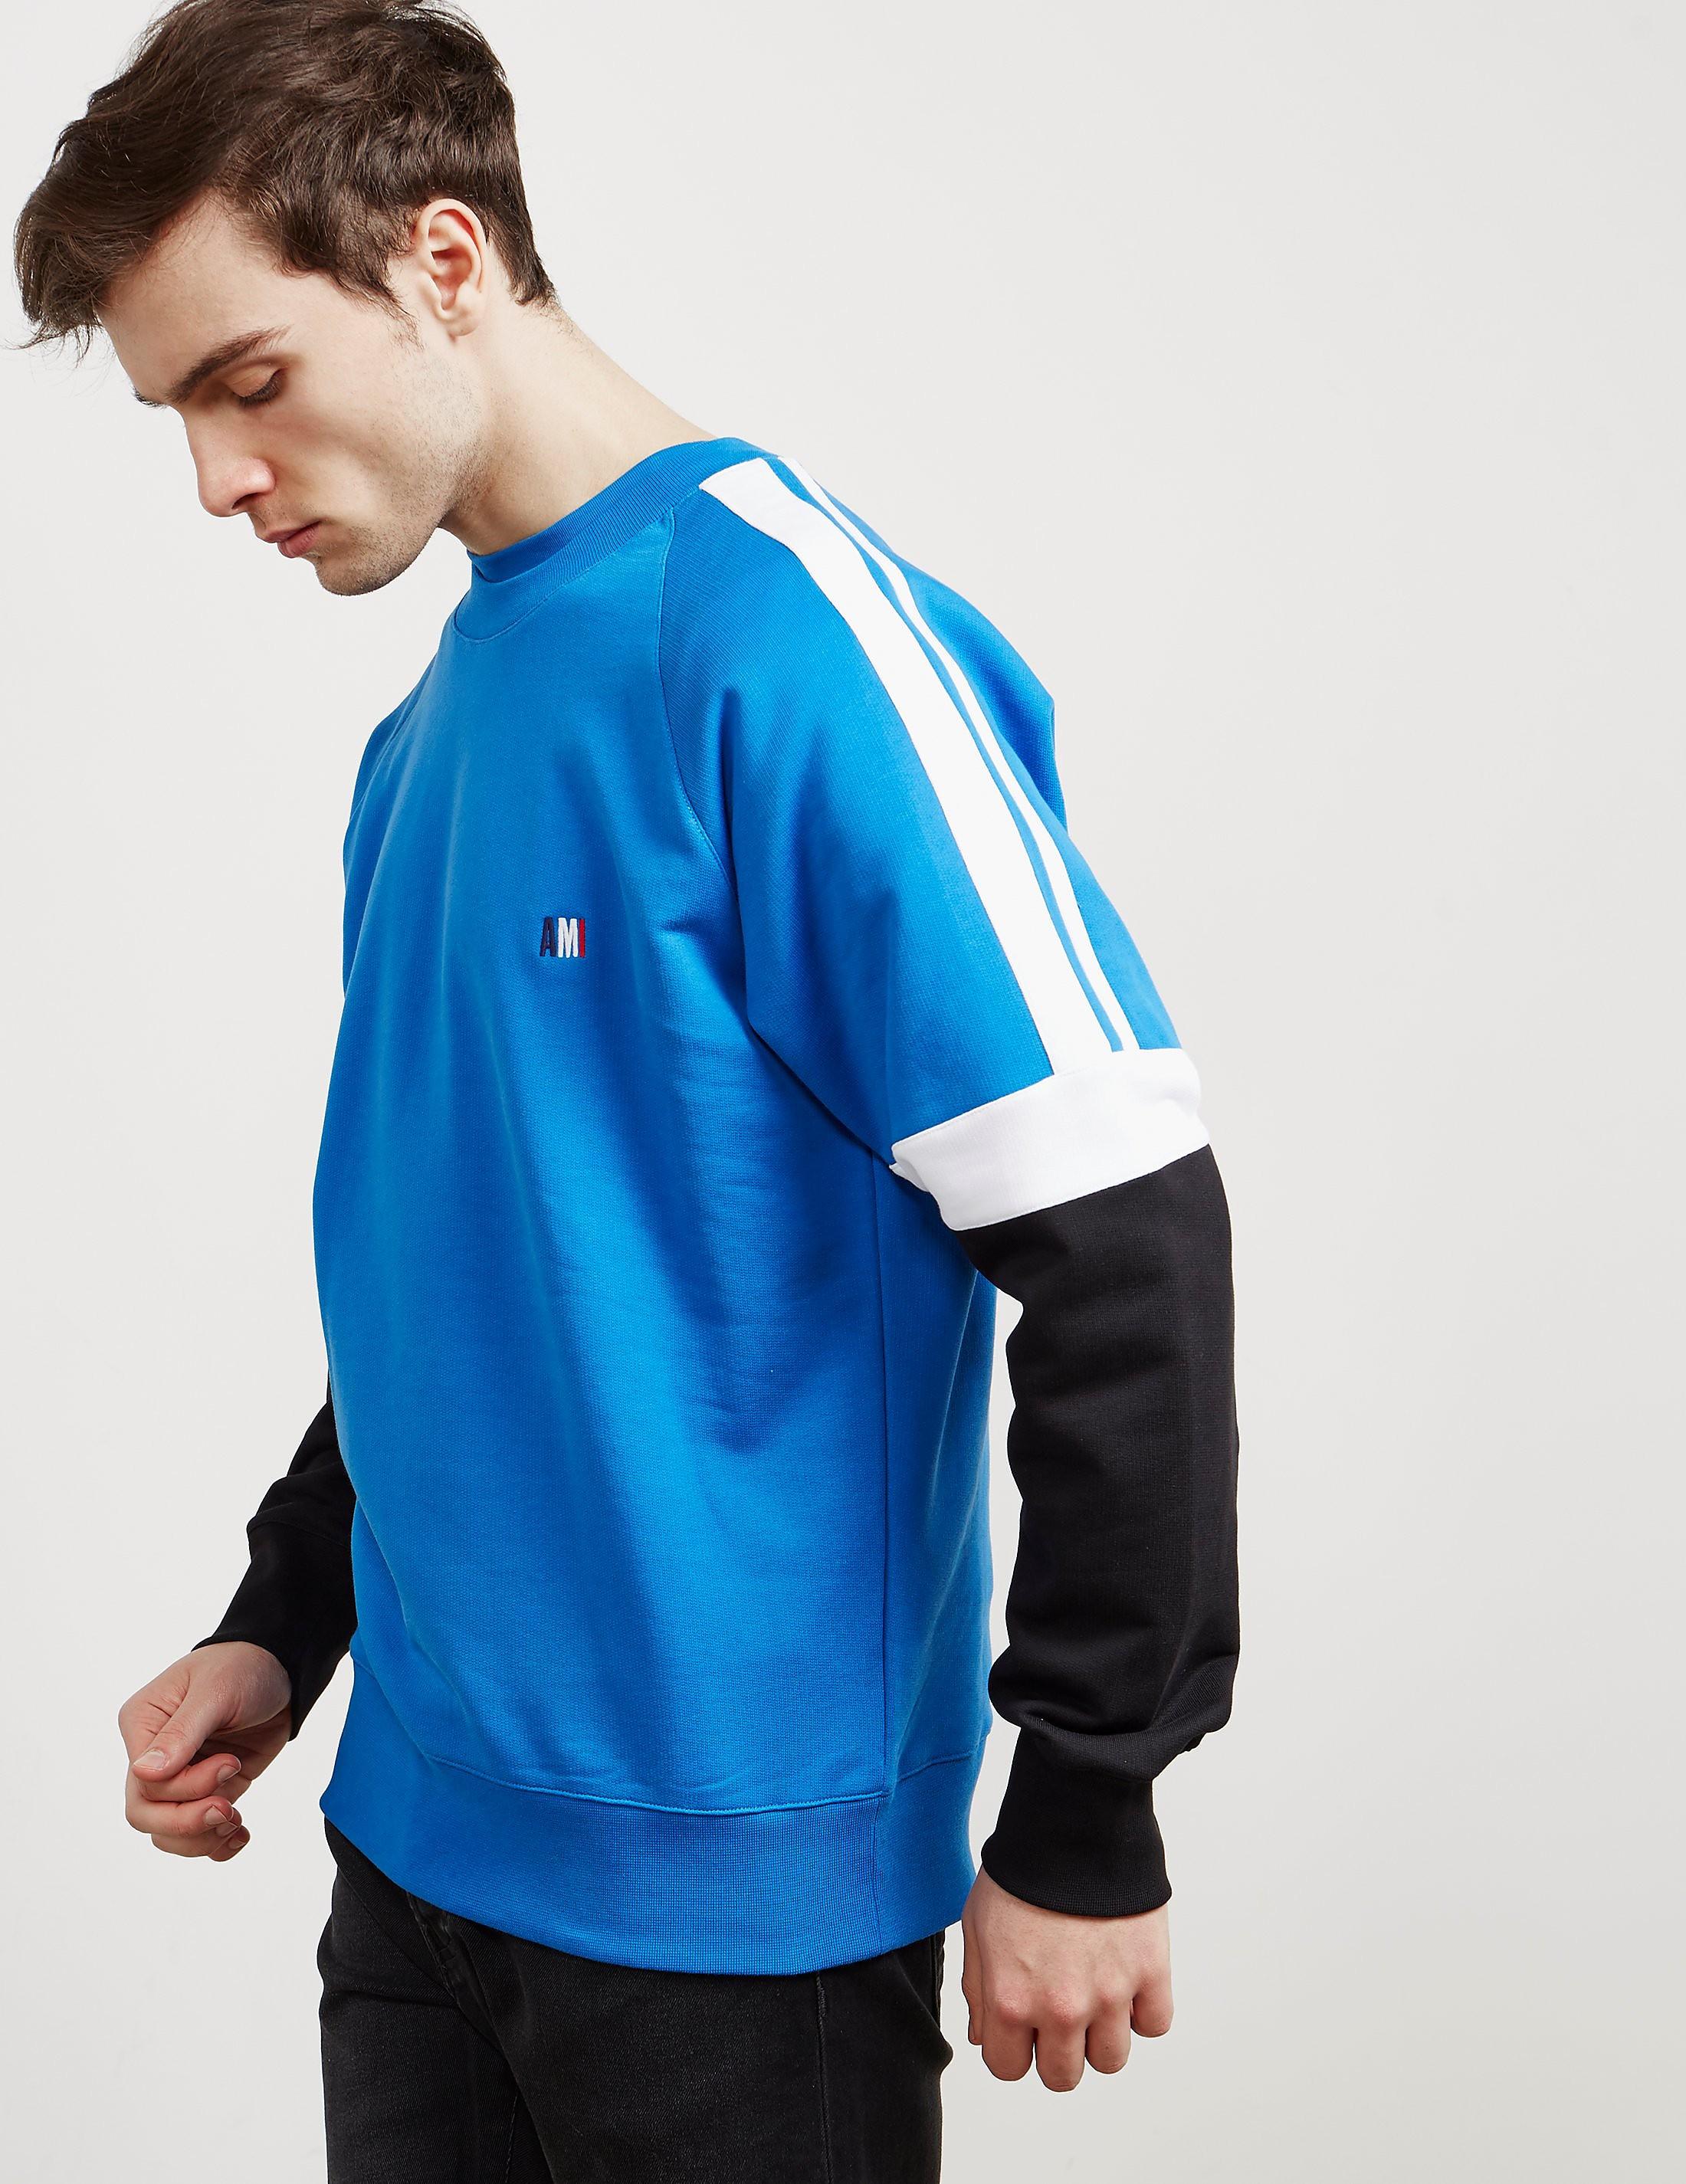 AMI Paris Tricolour Sweatshirt